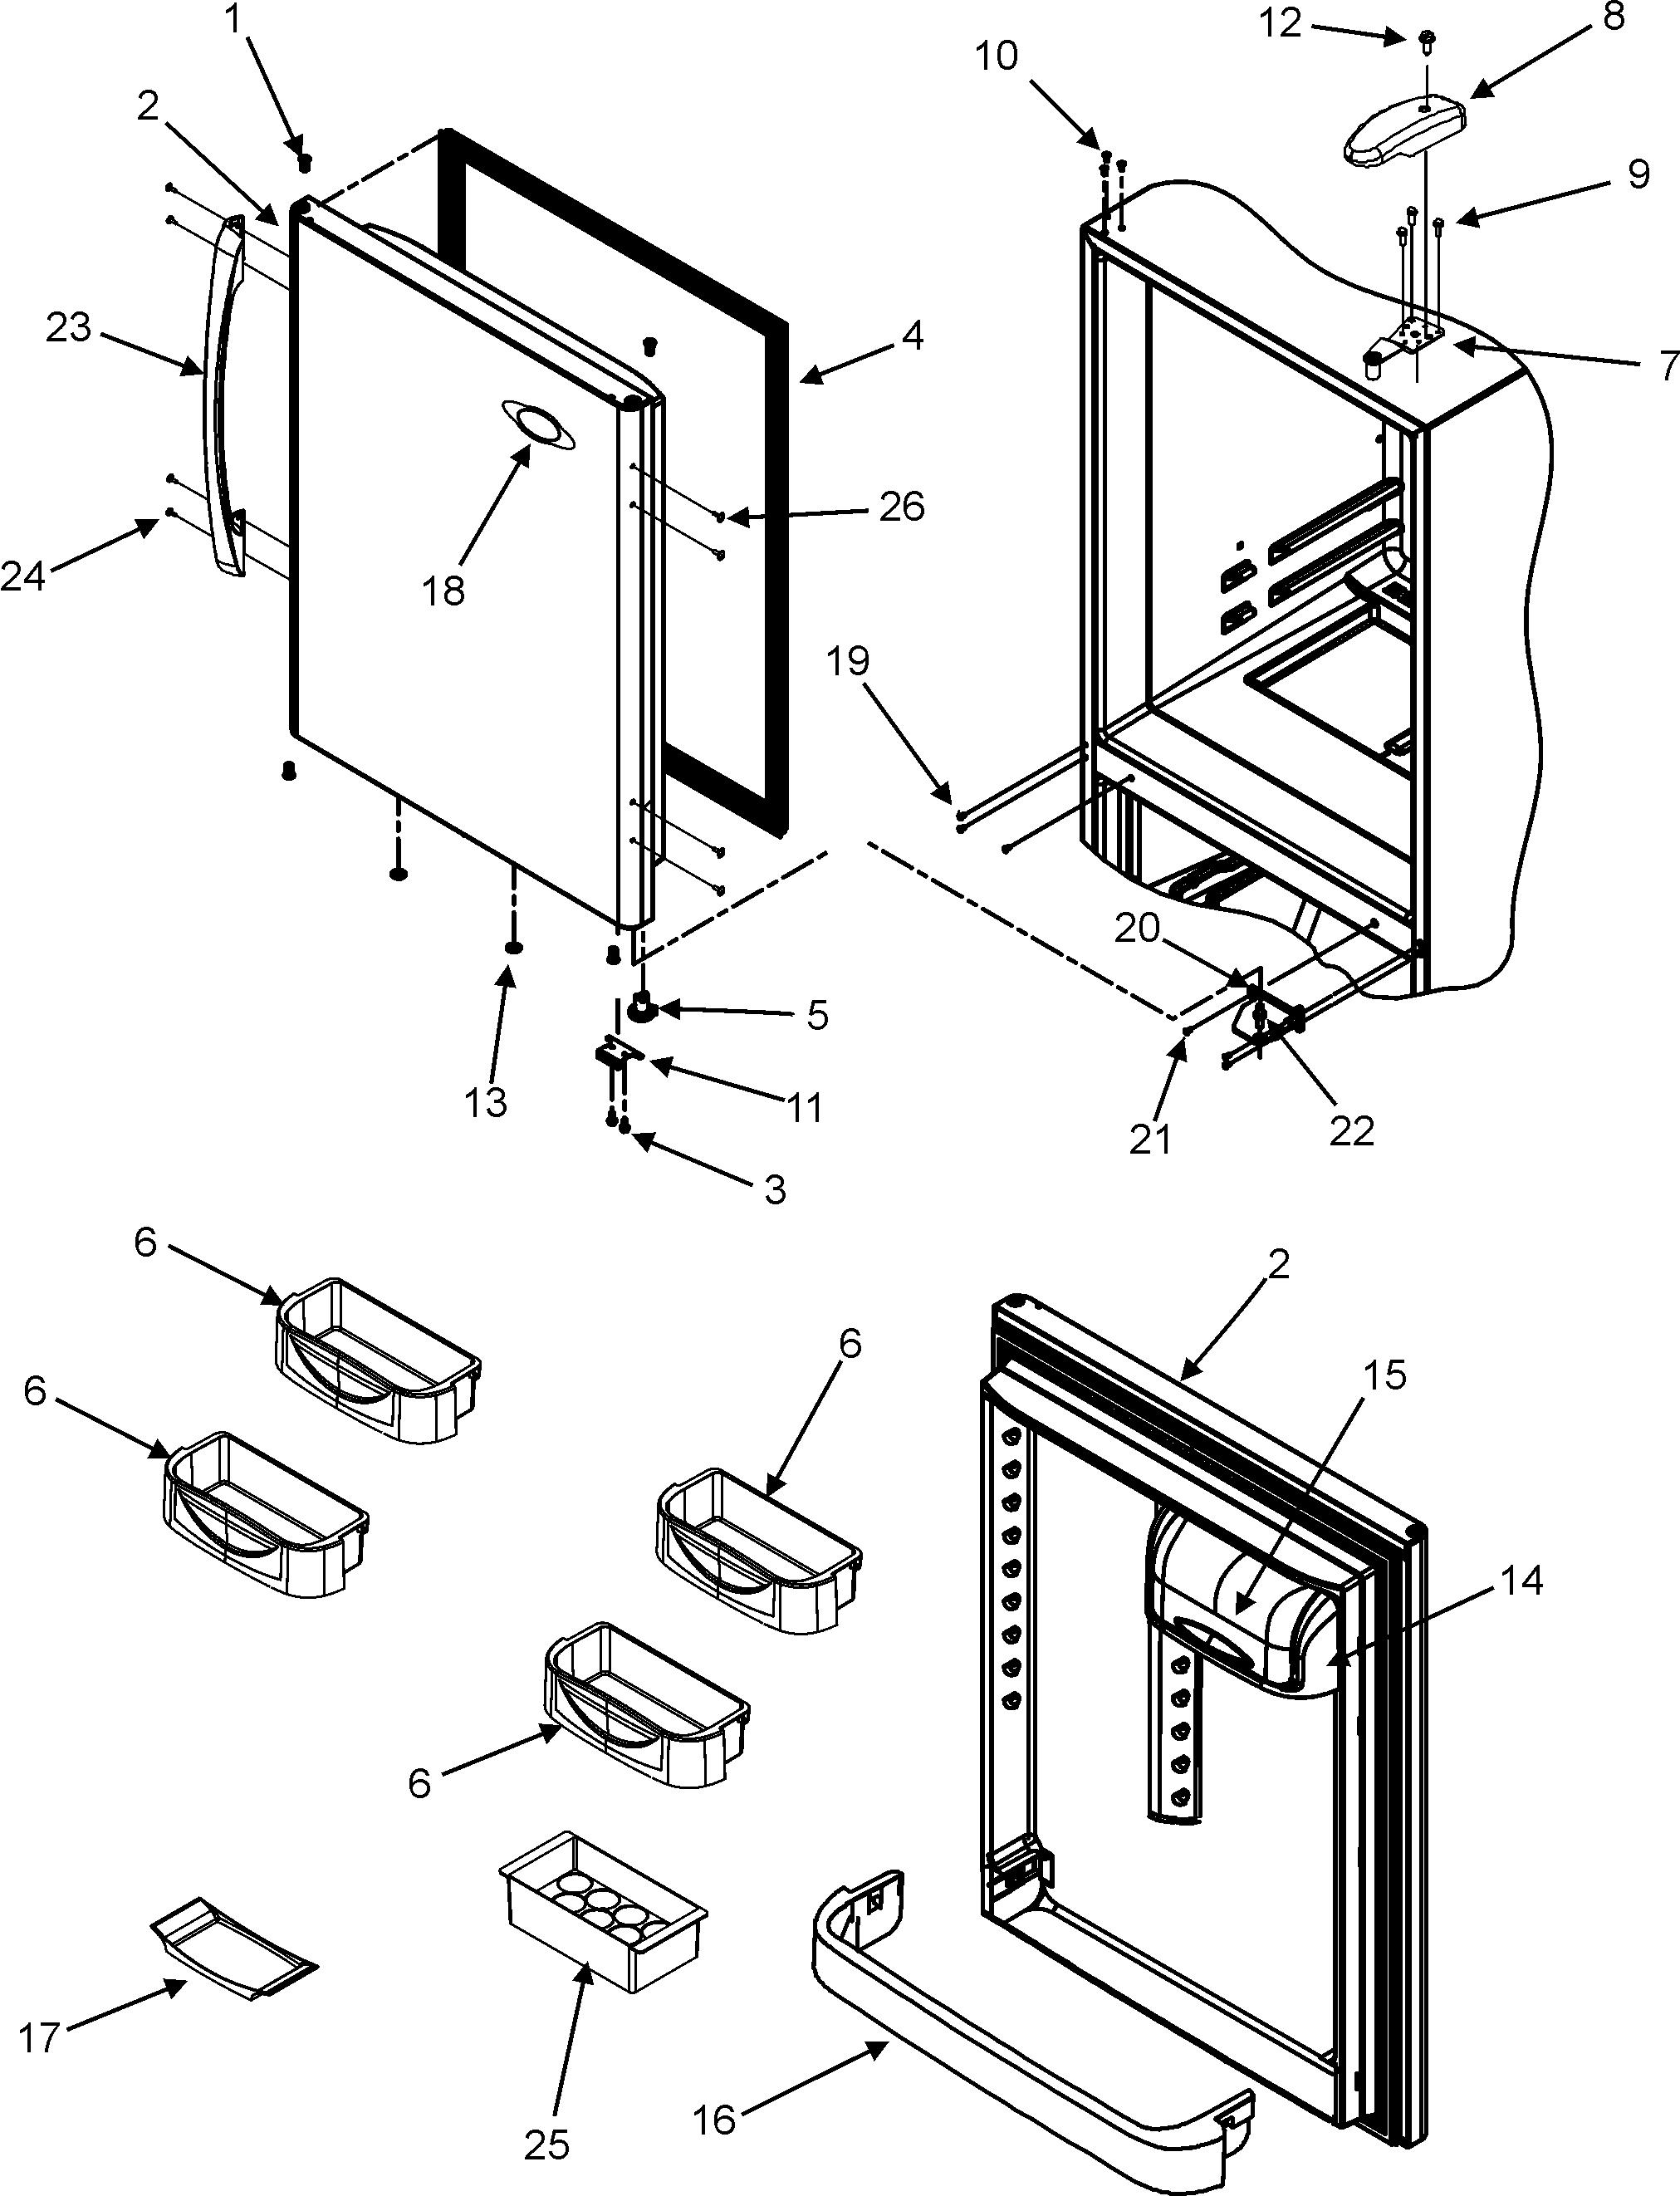 Maytag Refrigeratore: Maytag Refrigerator Parts Manual